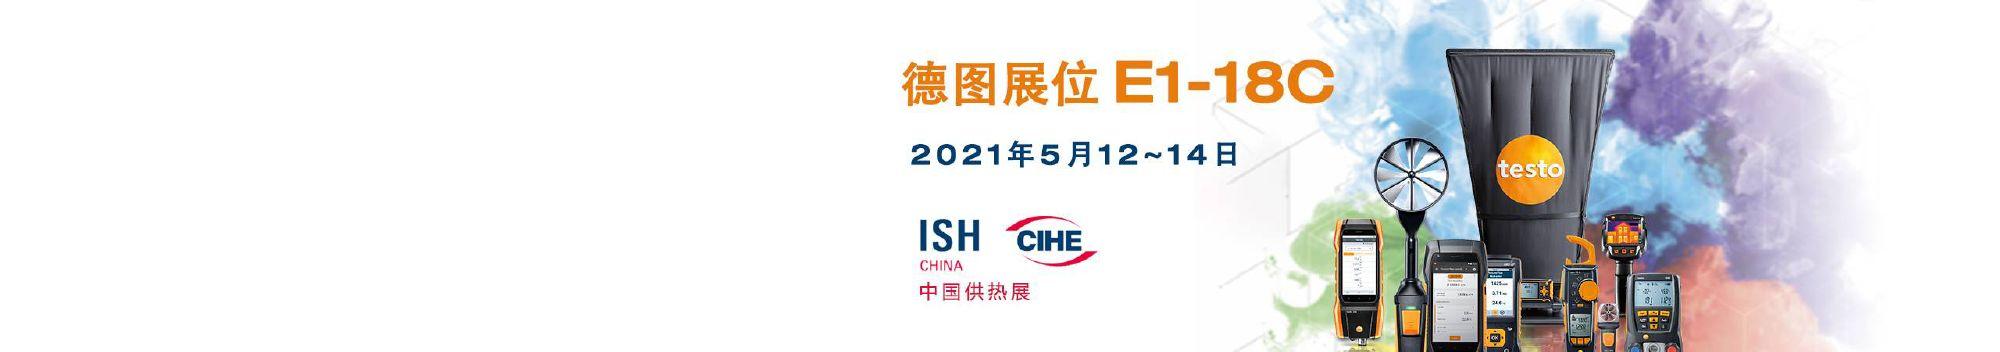 ISH China 2021 供热展 </br><b>德图展位 E1-18C</b> </br>欢迎您的莅临